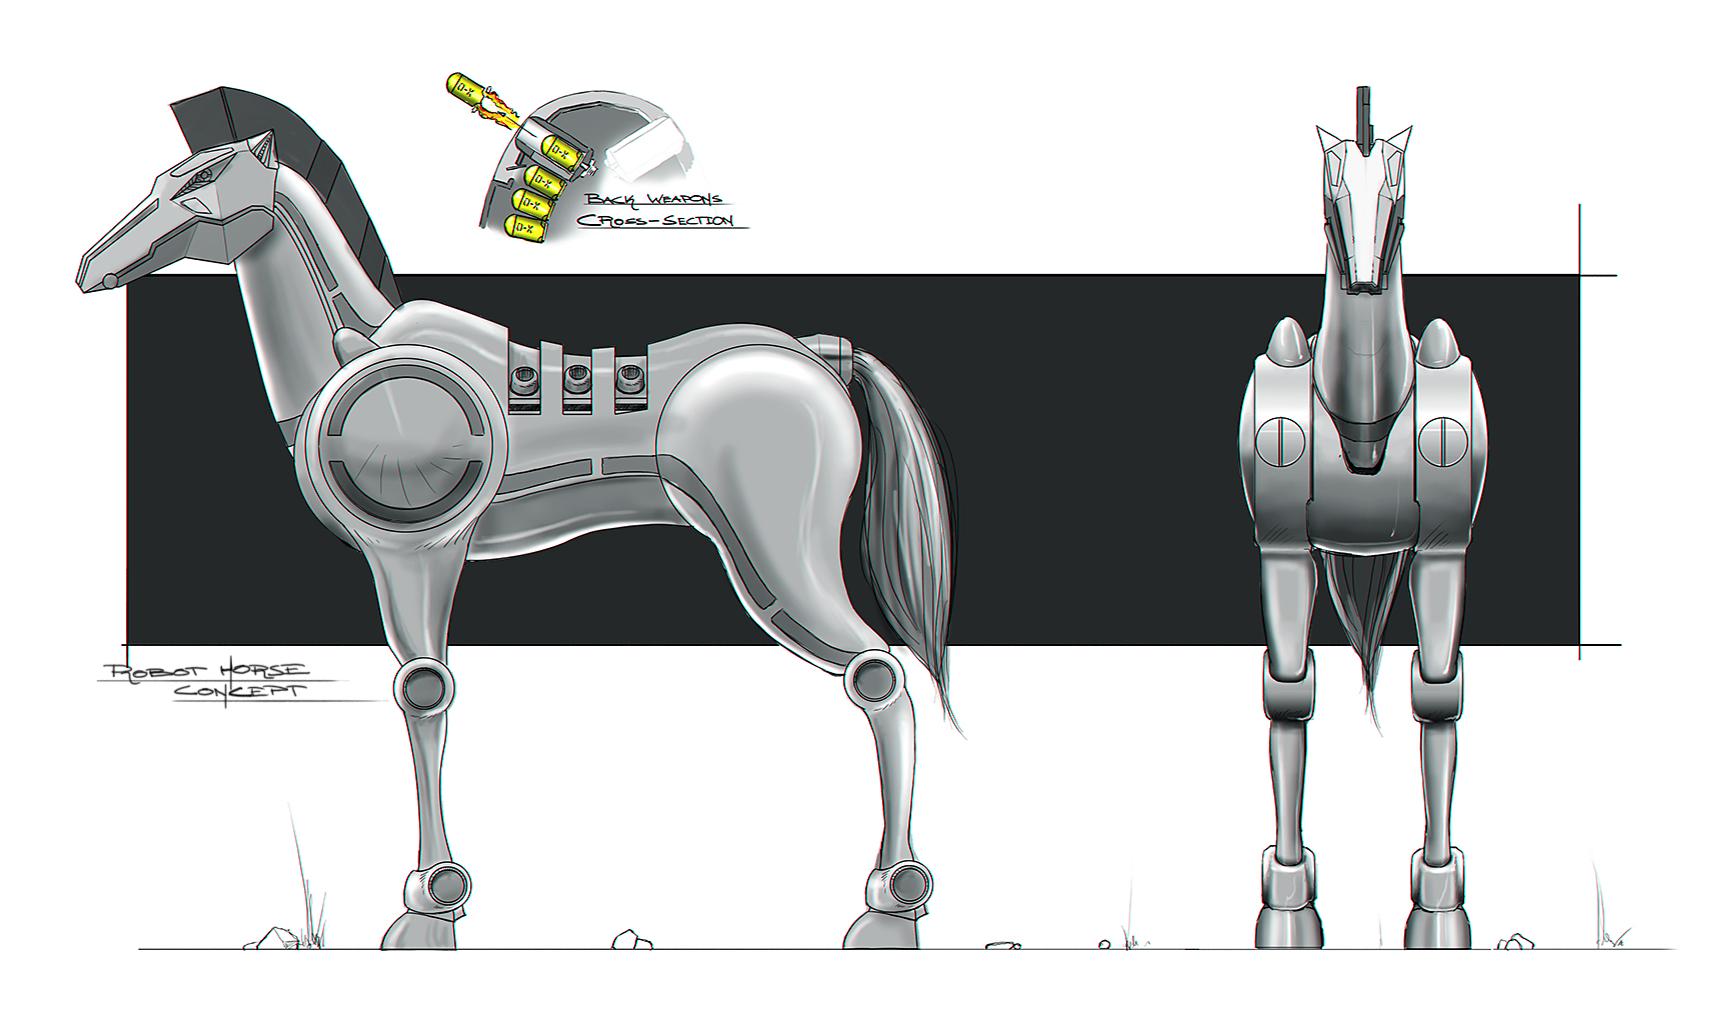 Deviantarts Robot Horse: Robot Horse Concept Art Image